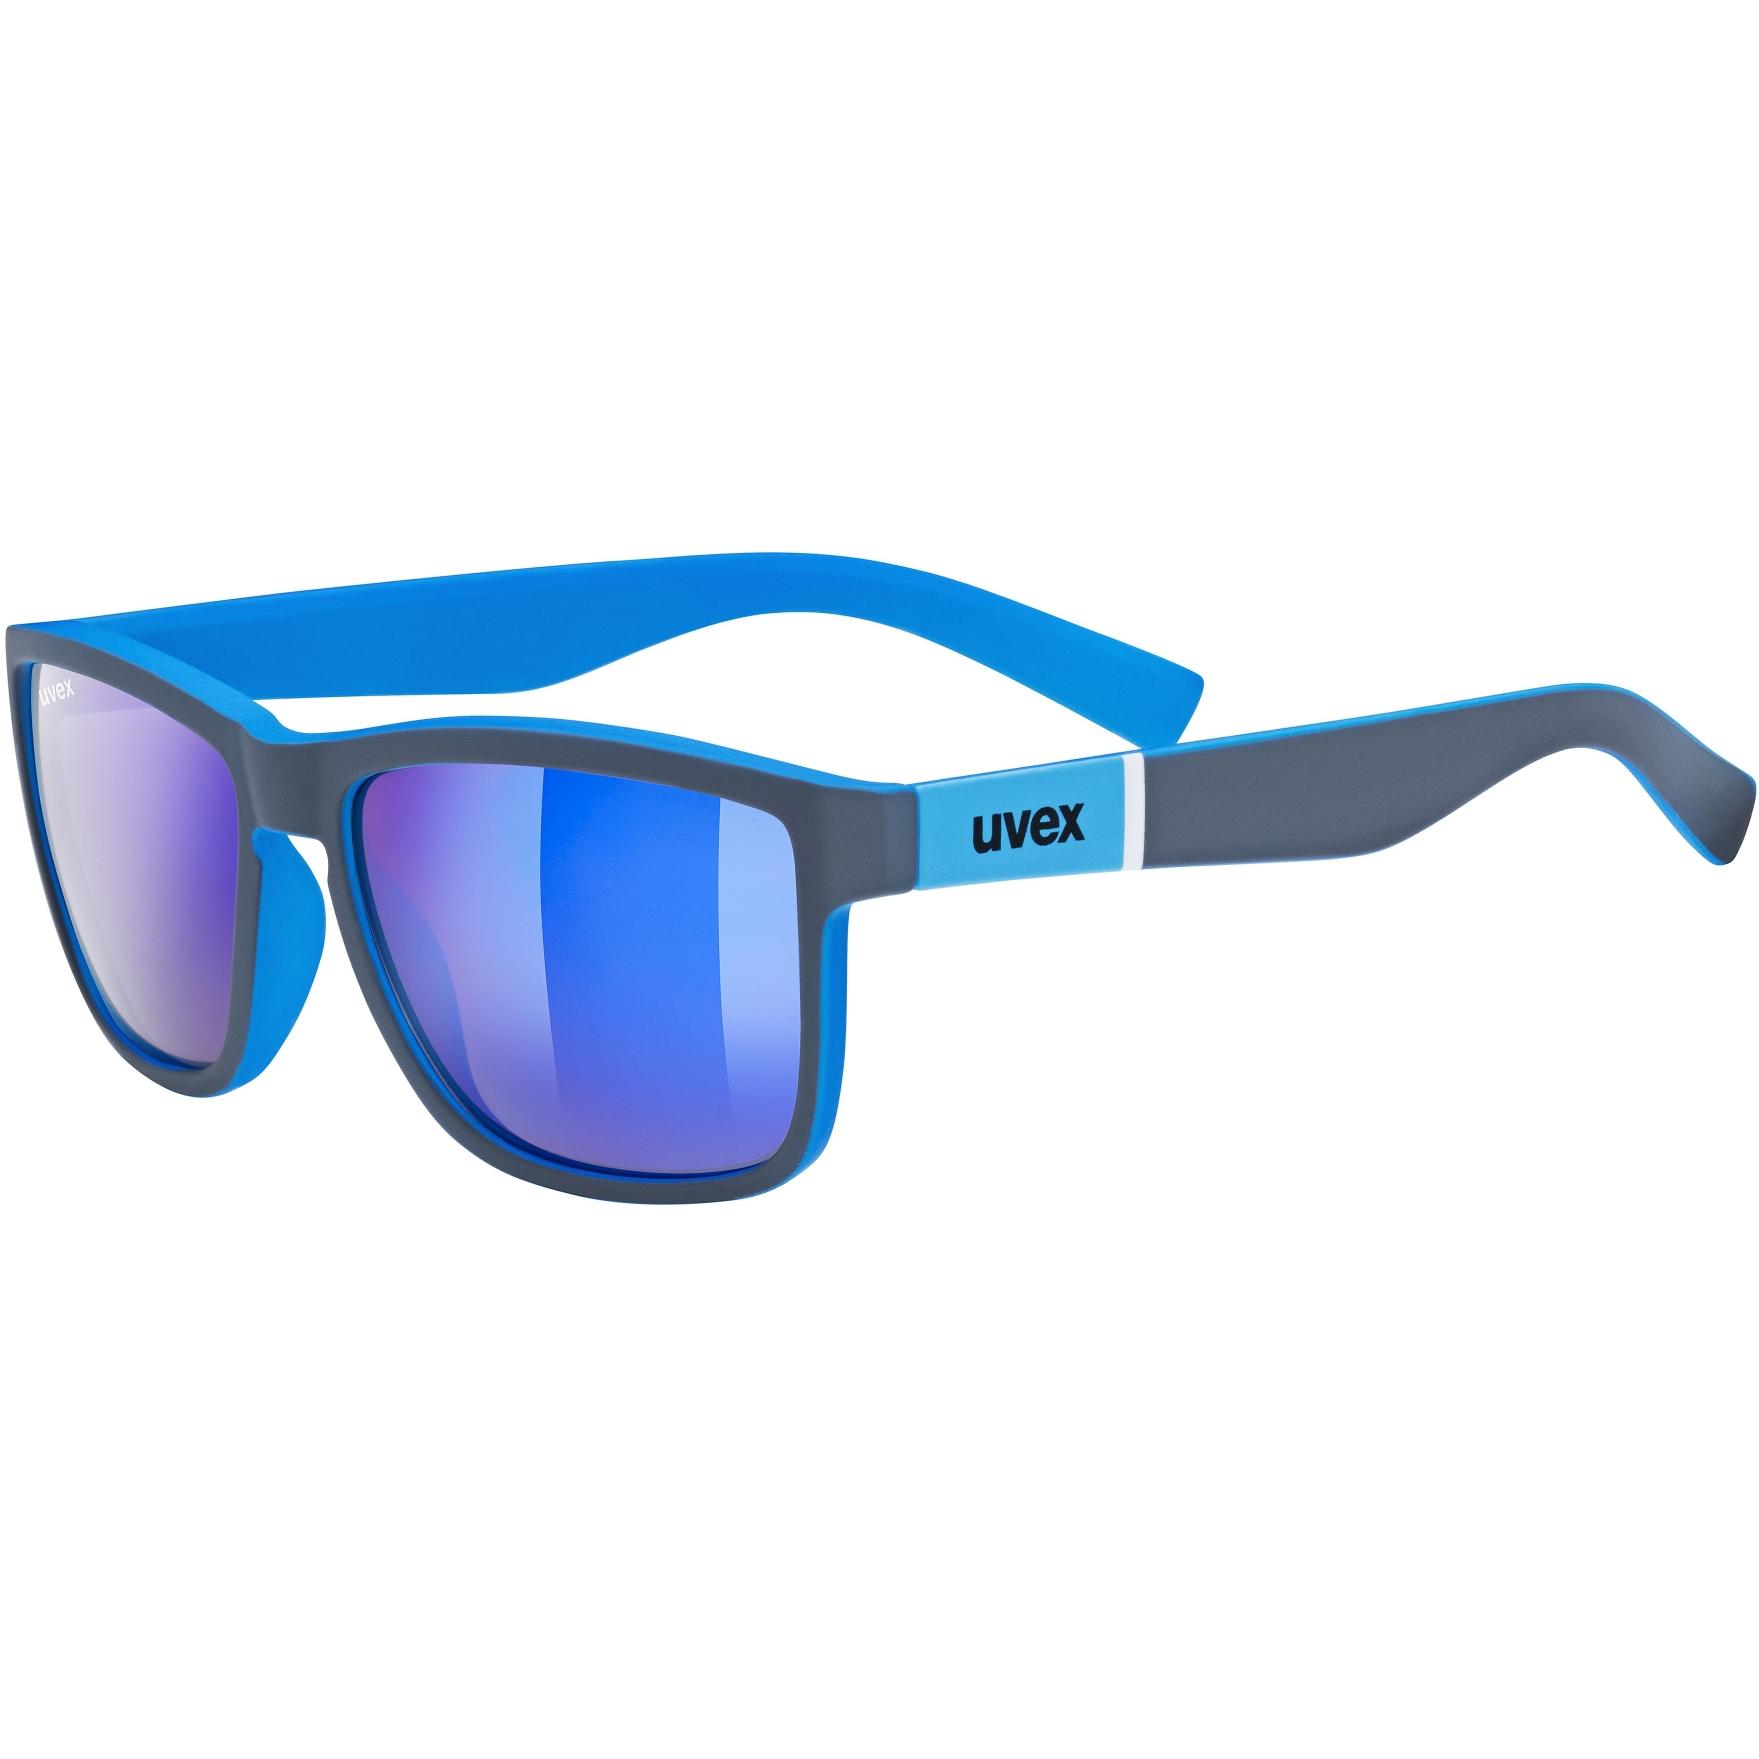 Uvex lgl 39 Glasses - grey mat blue/mirror blue